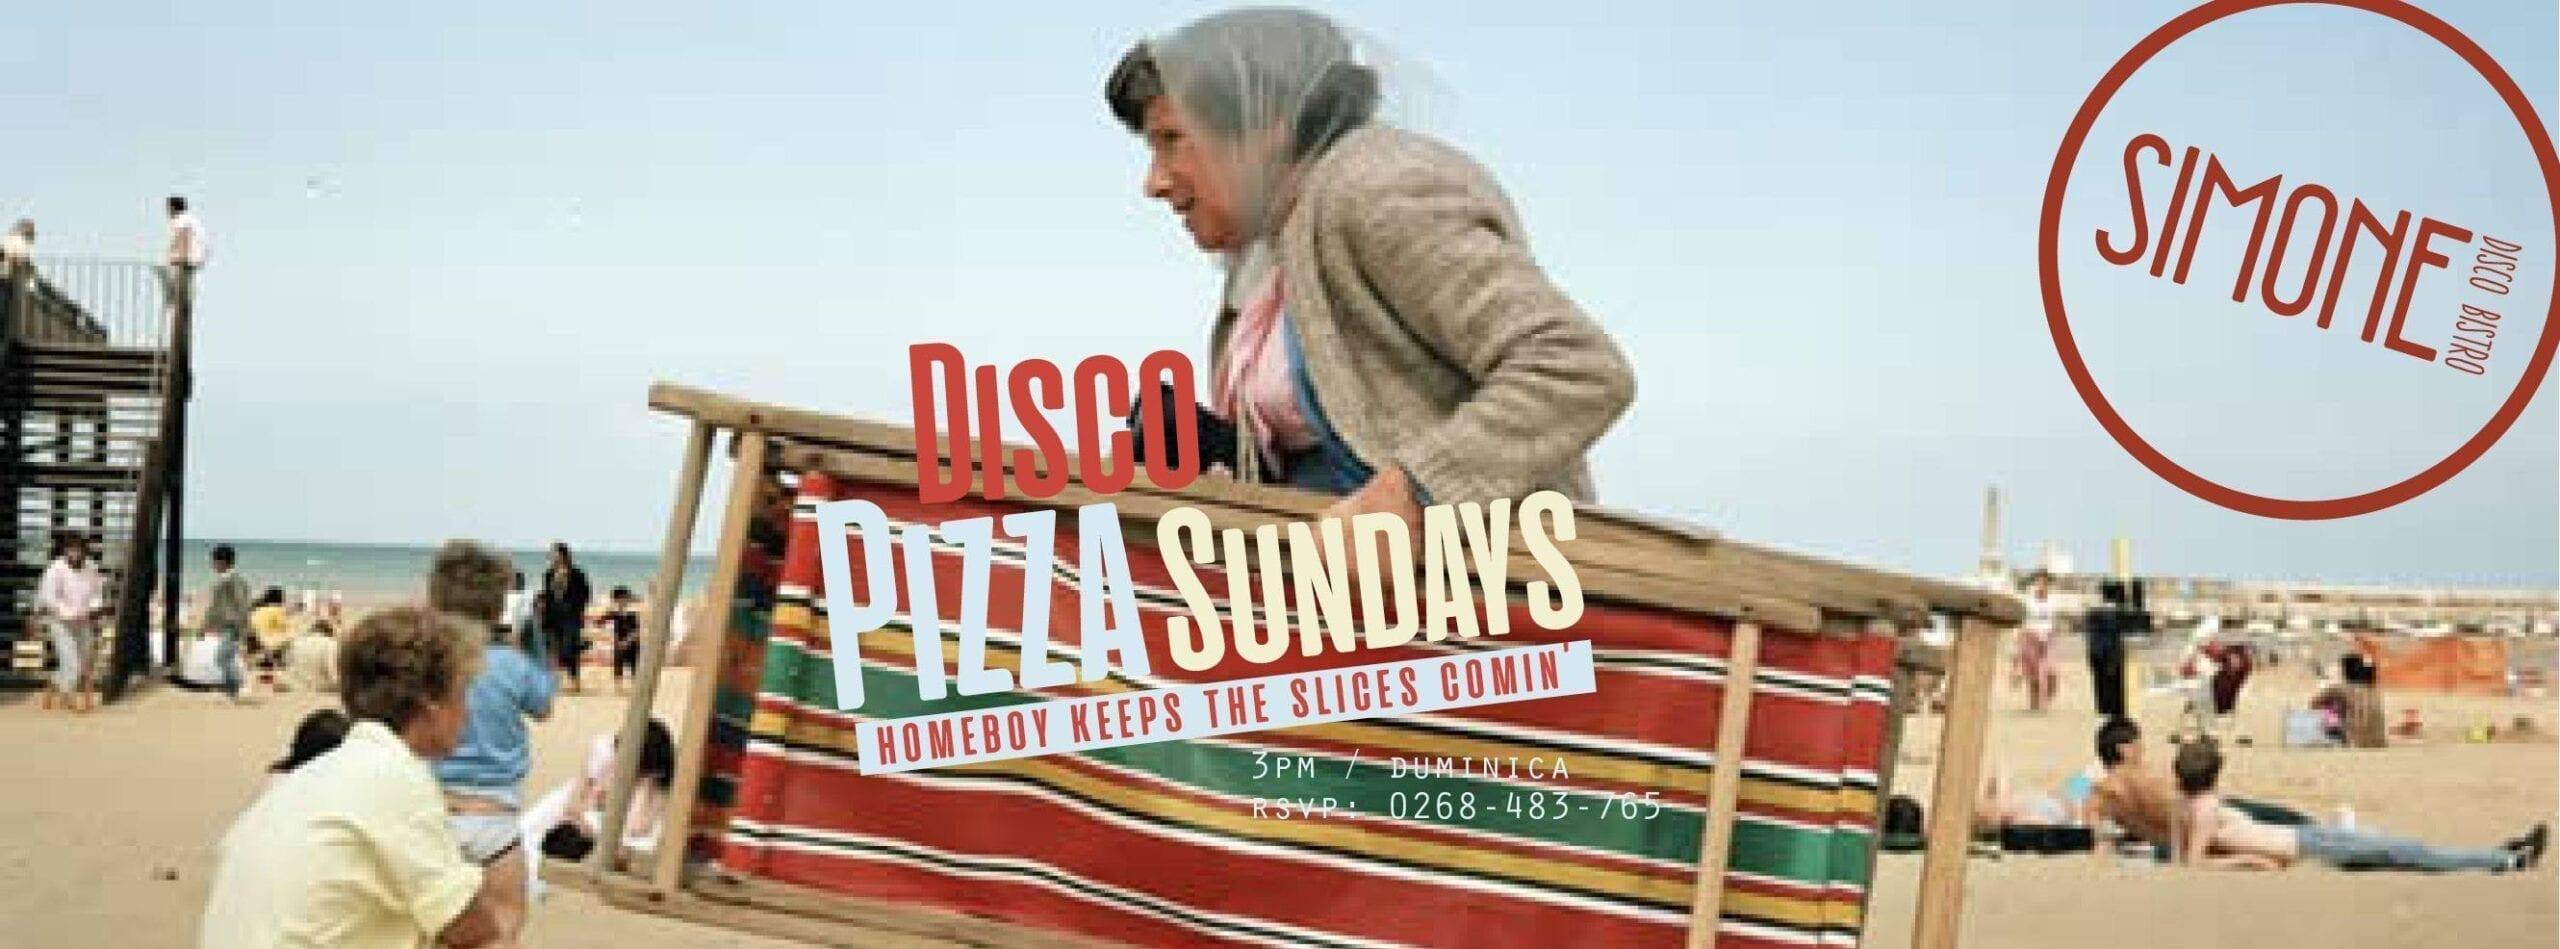 Homeboy la Disco pizza Sundays